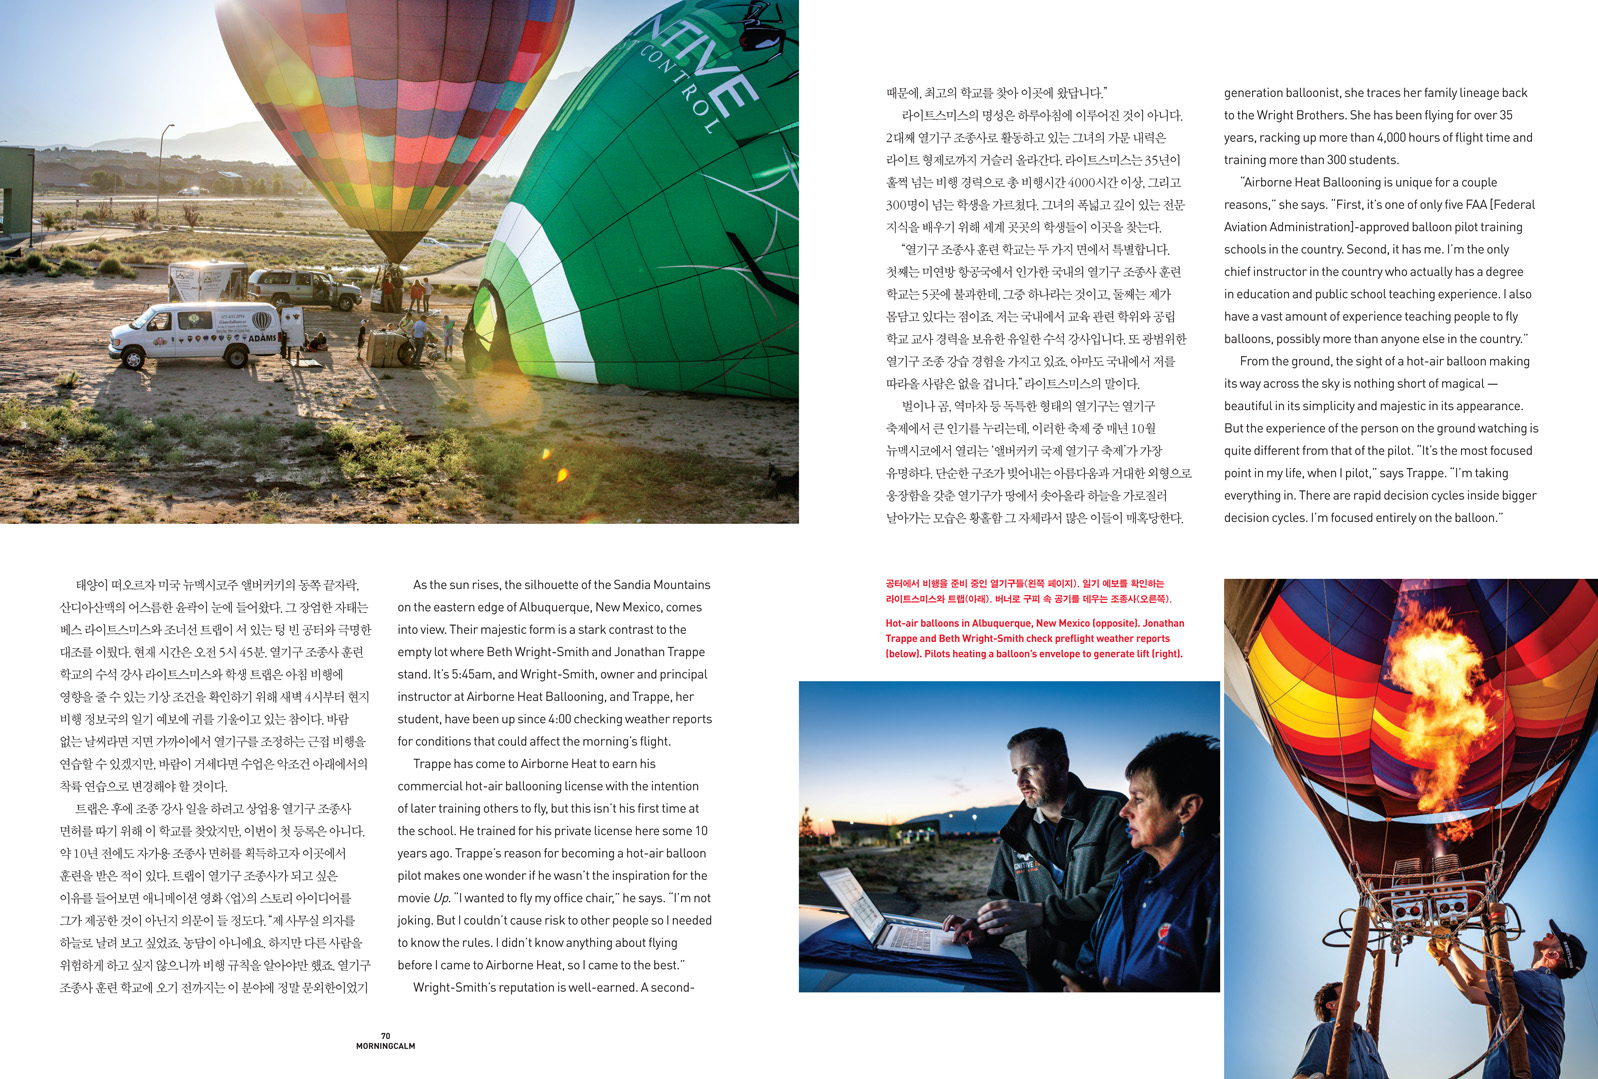 2017_10---World-Academies---Airborne-Heat-Ballooning-1-2